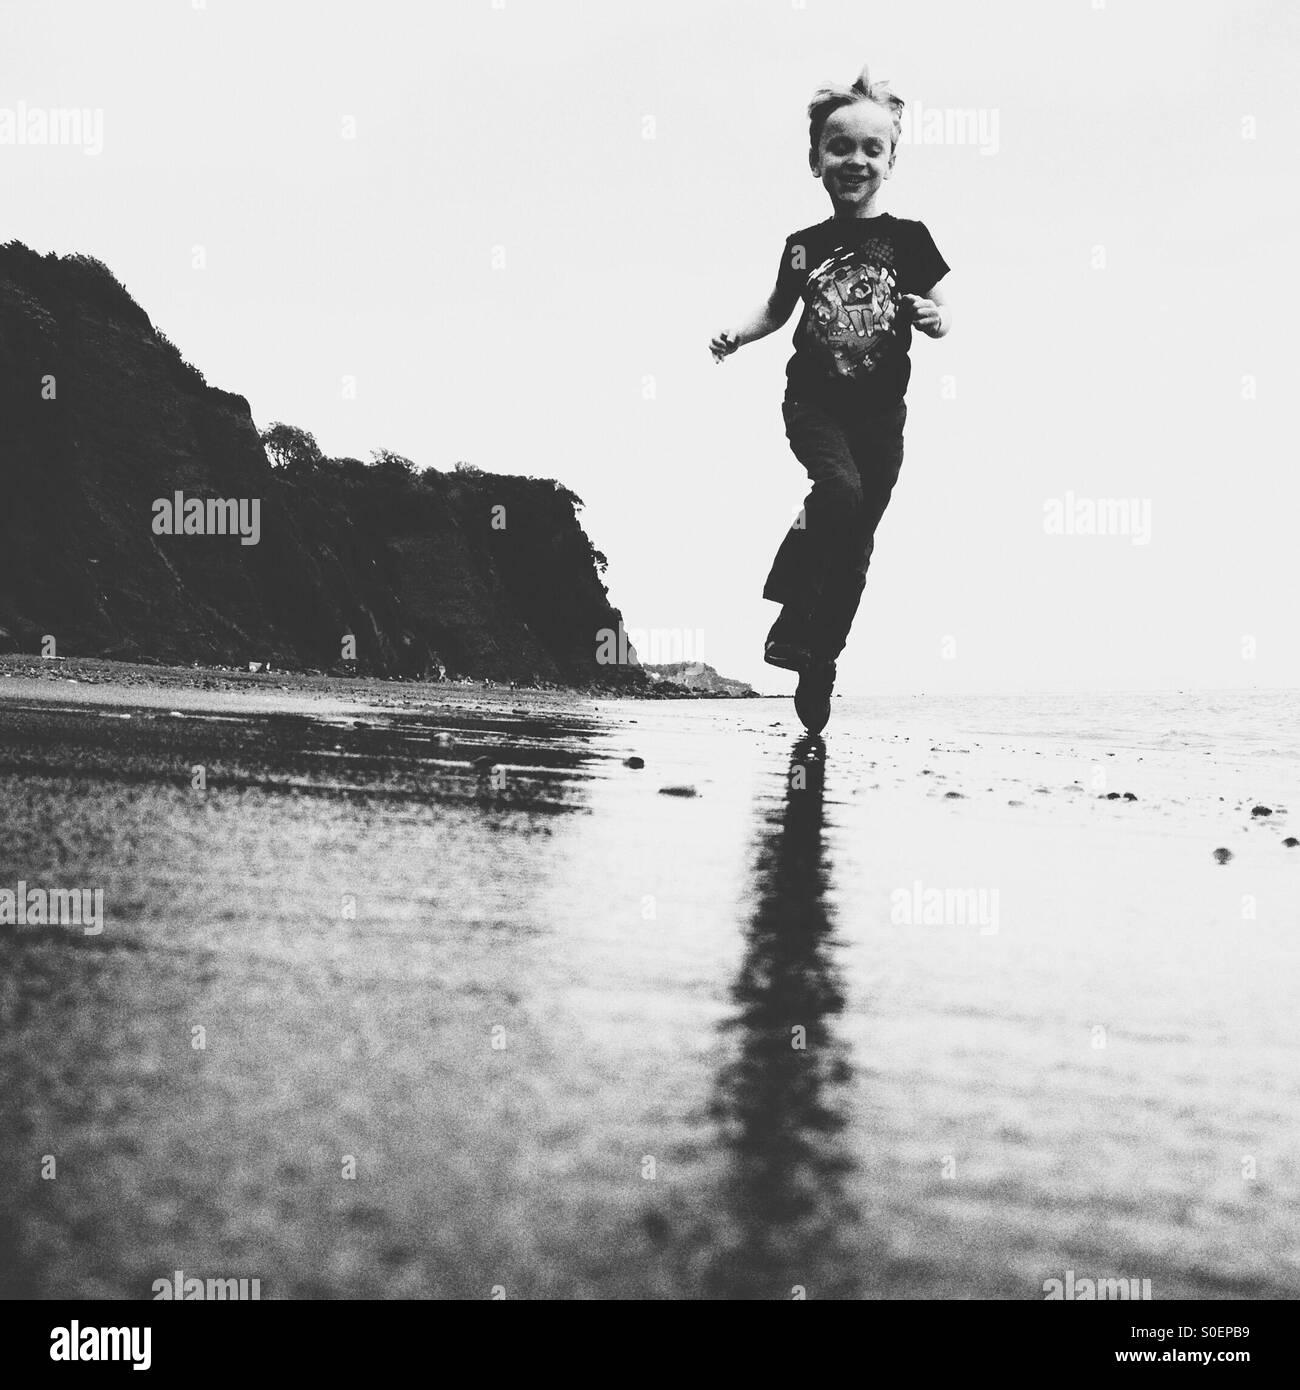 Boy running on a beach - Stock Image